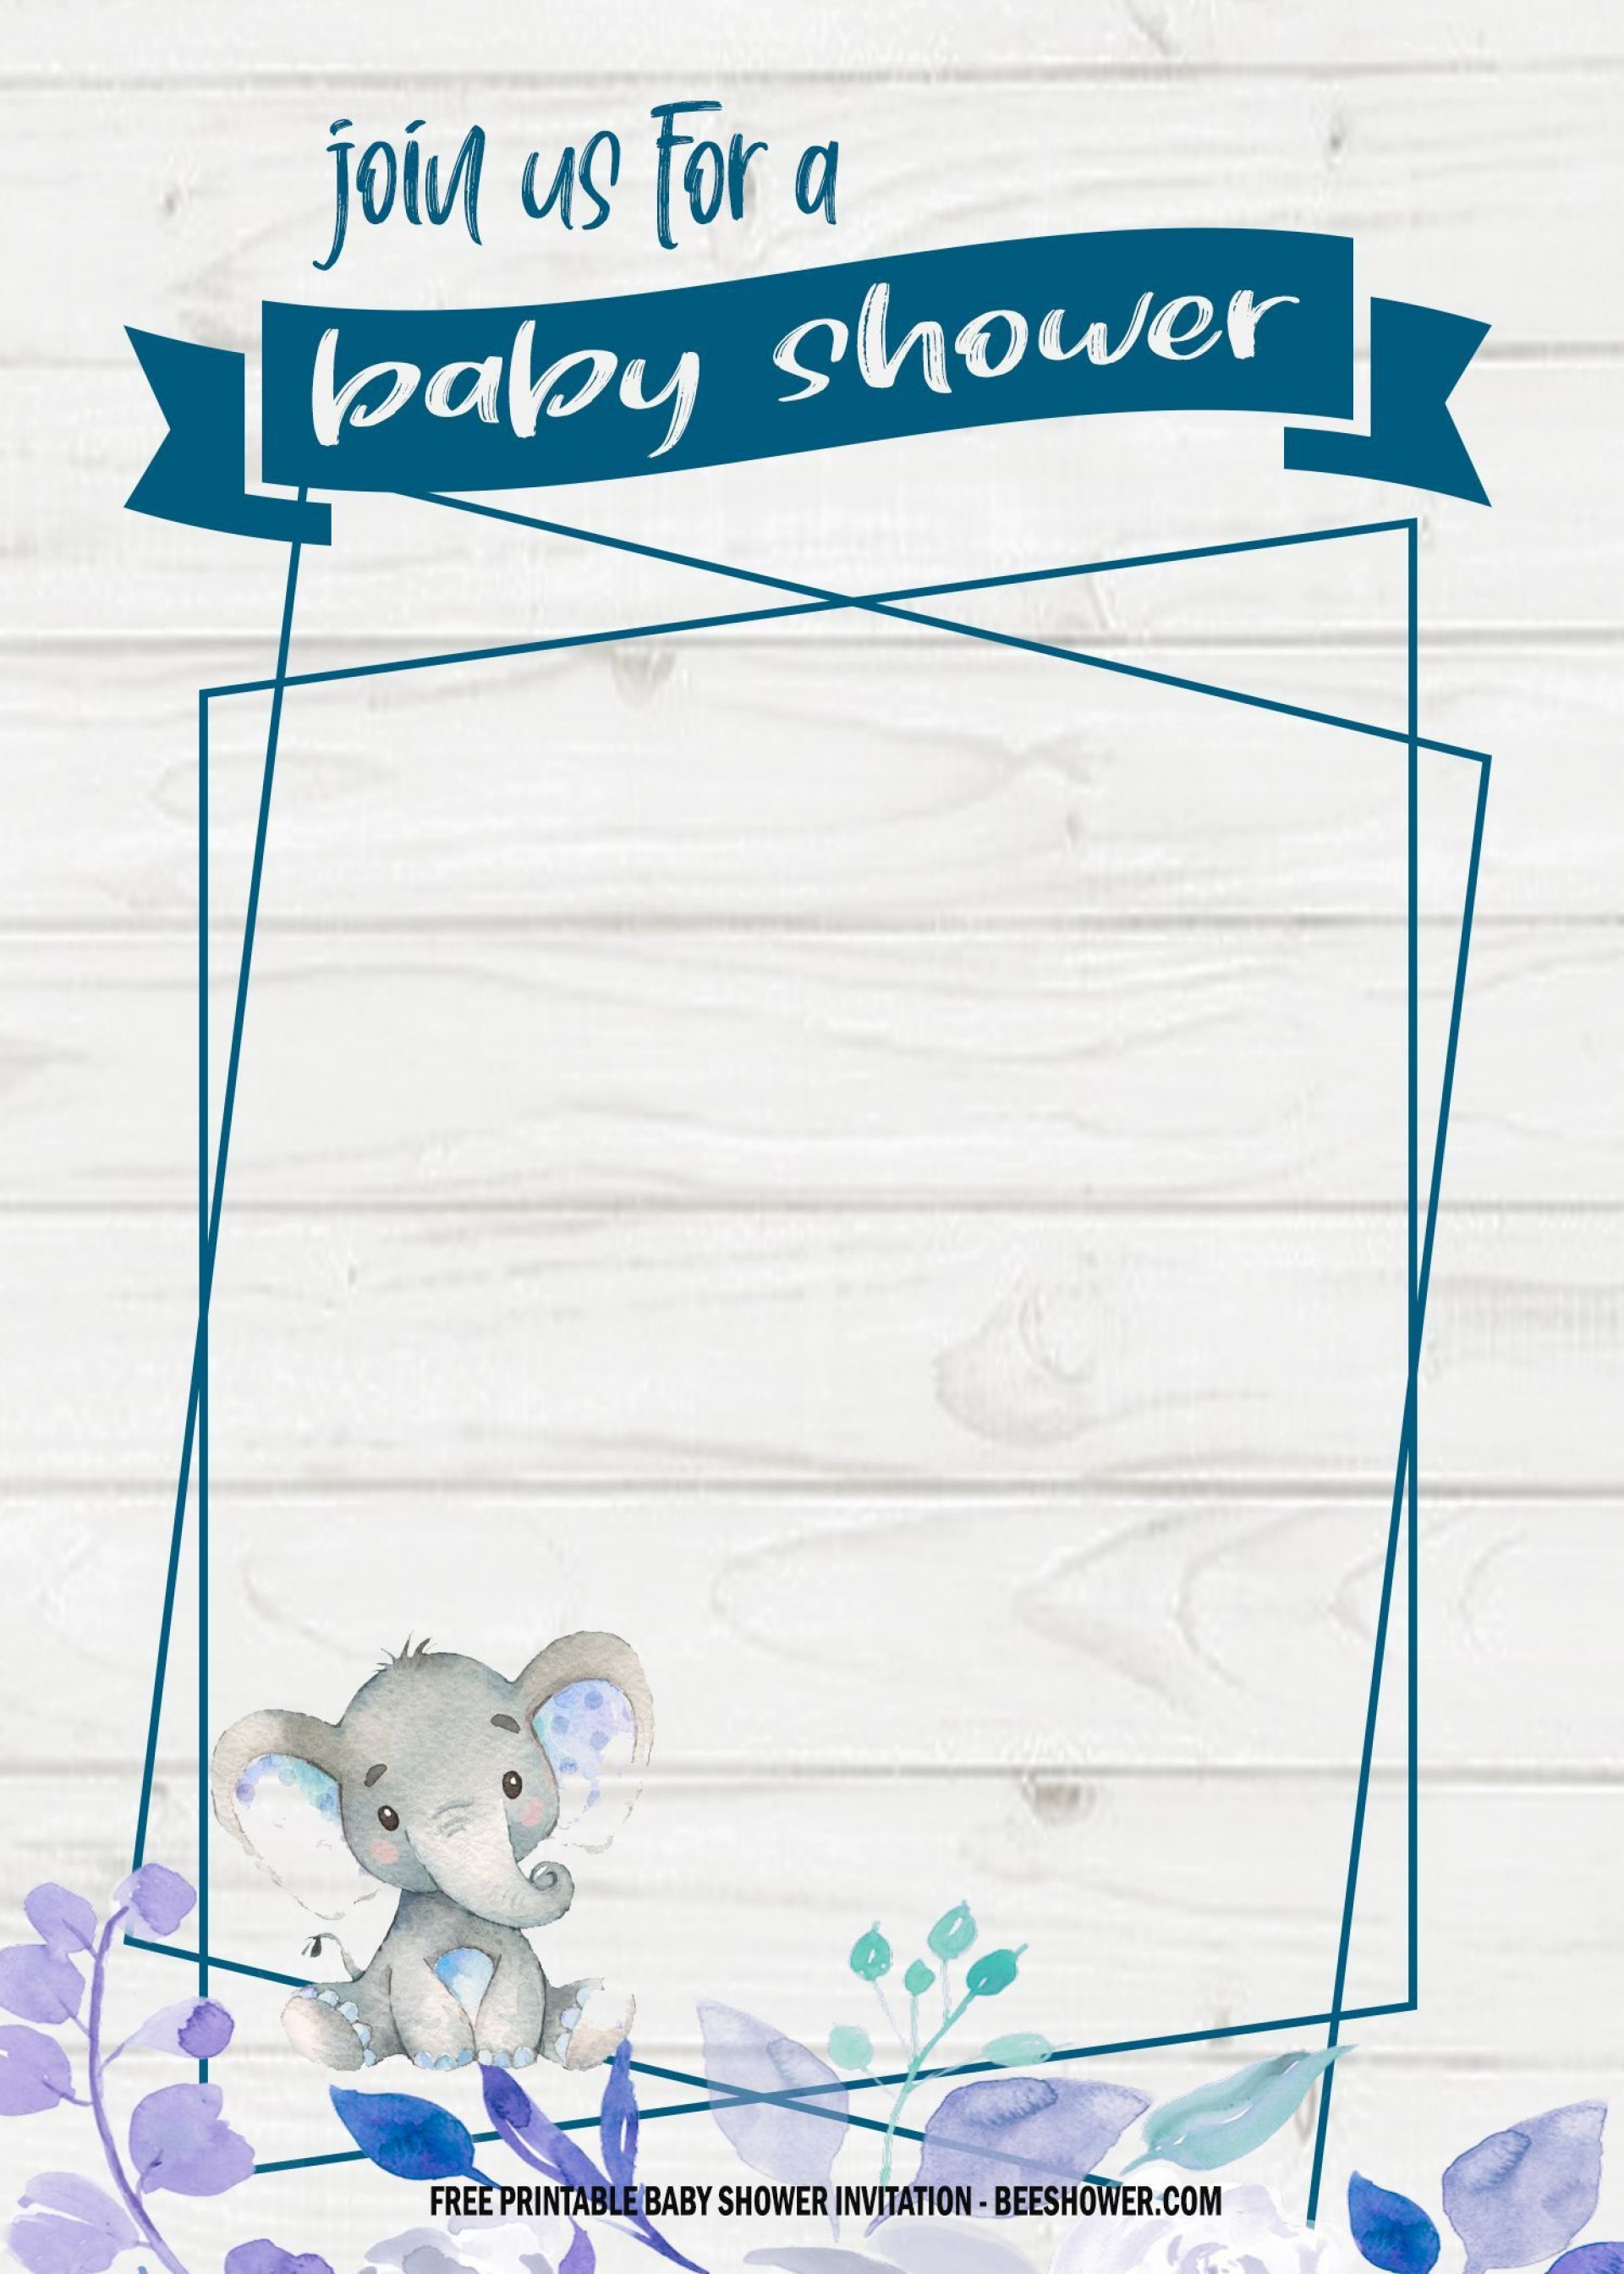 006 Stirring Free Baby Shower Printable Elephant Highest Clarity  Decoration1920